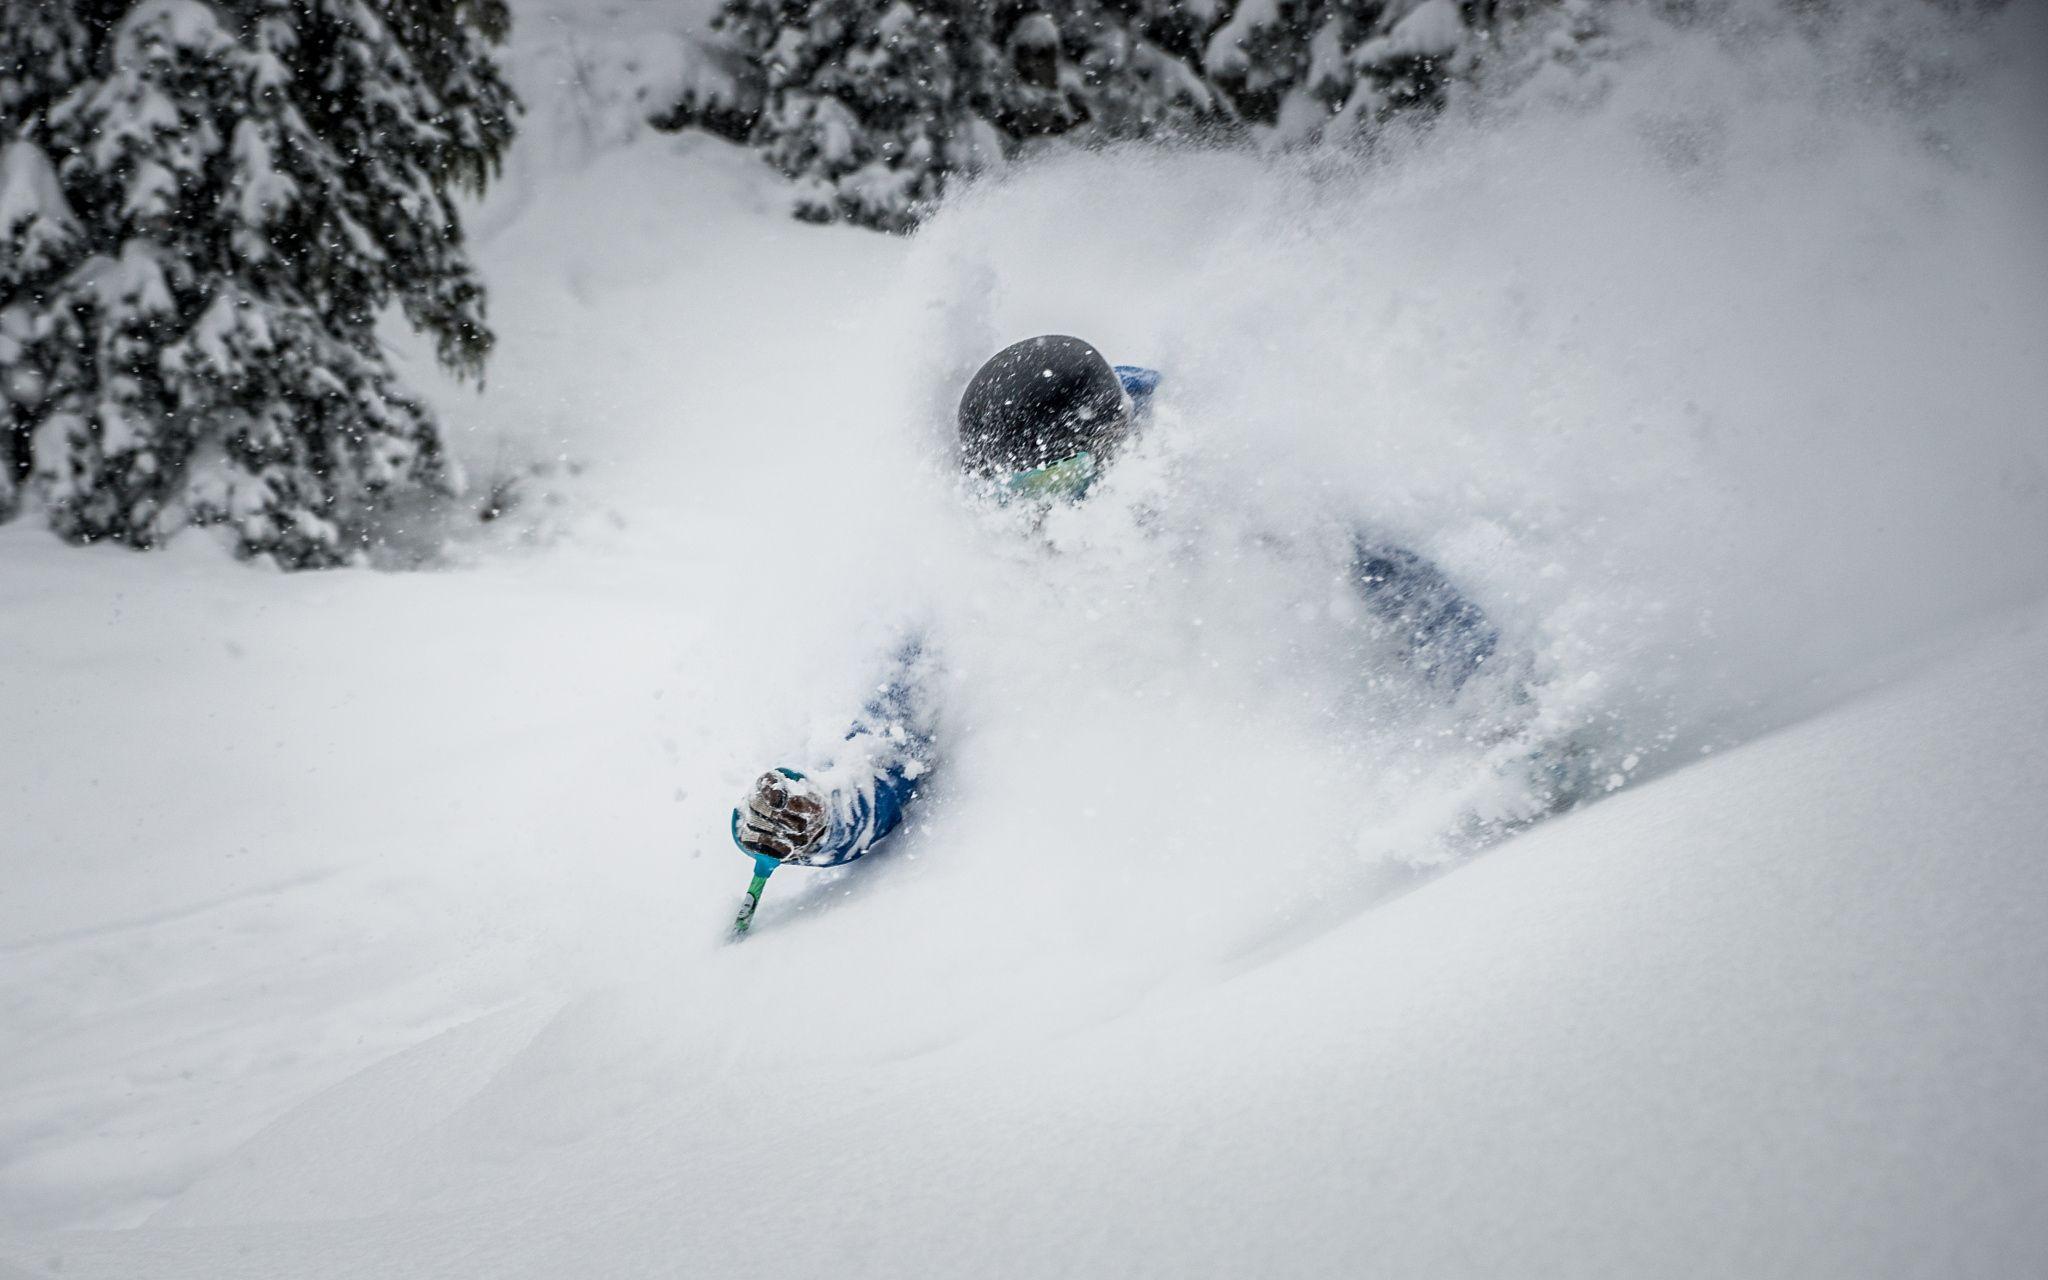 Deep Powder Skiing Powder Skiing Skiing Ski Touring